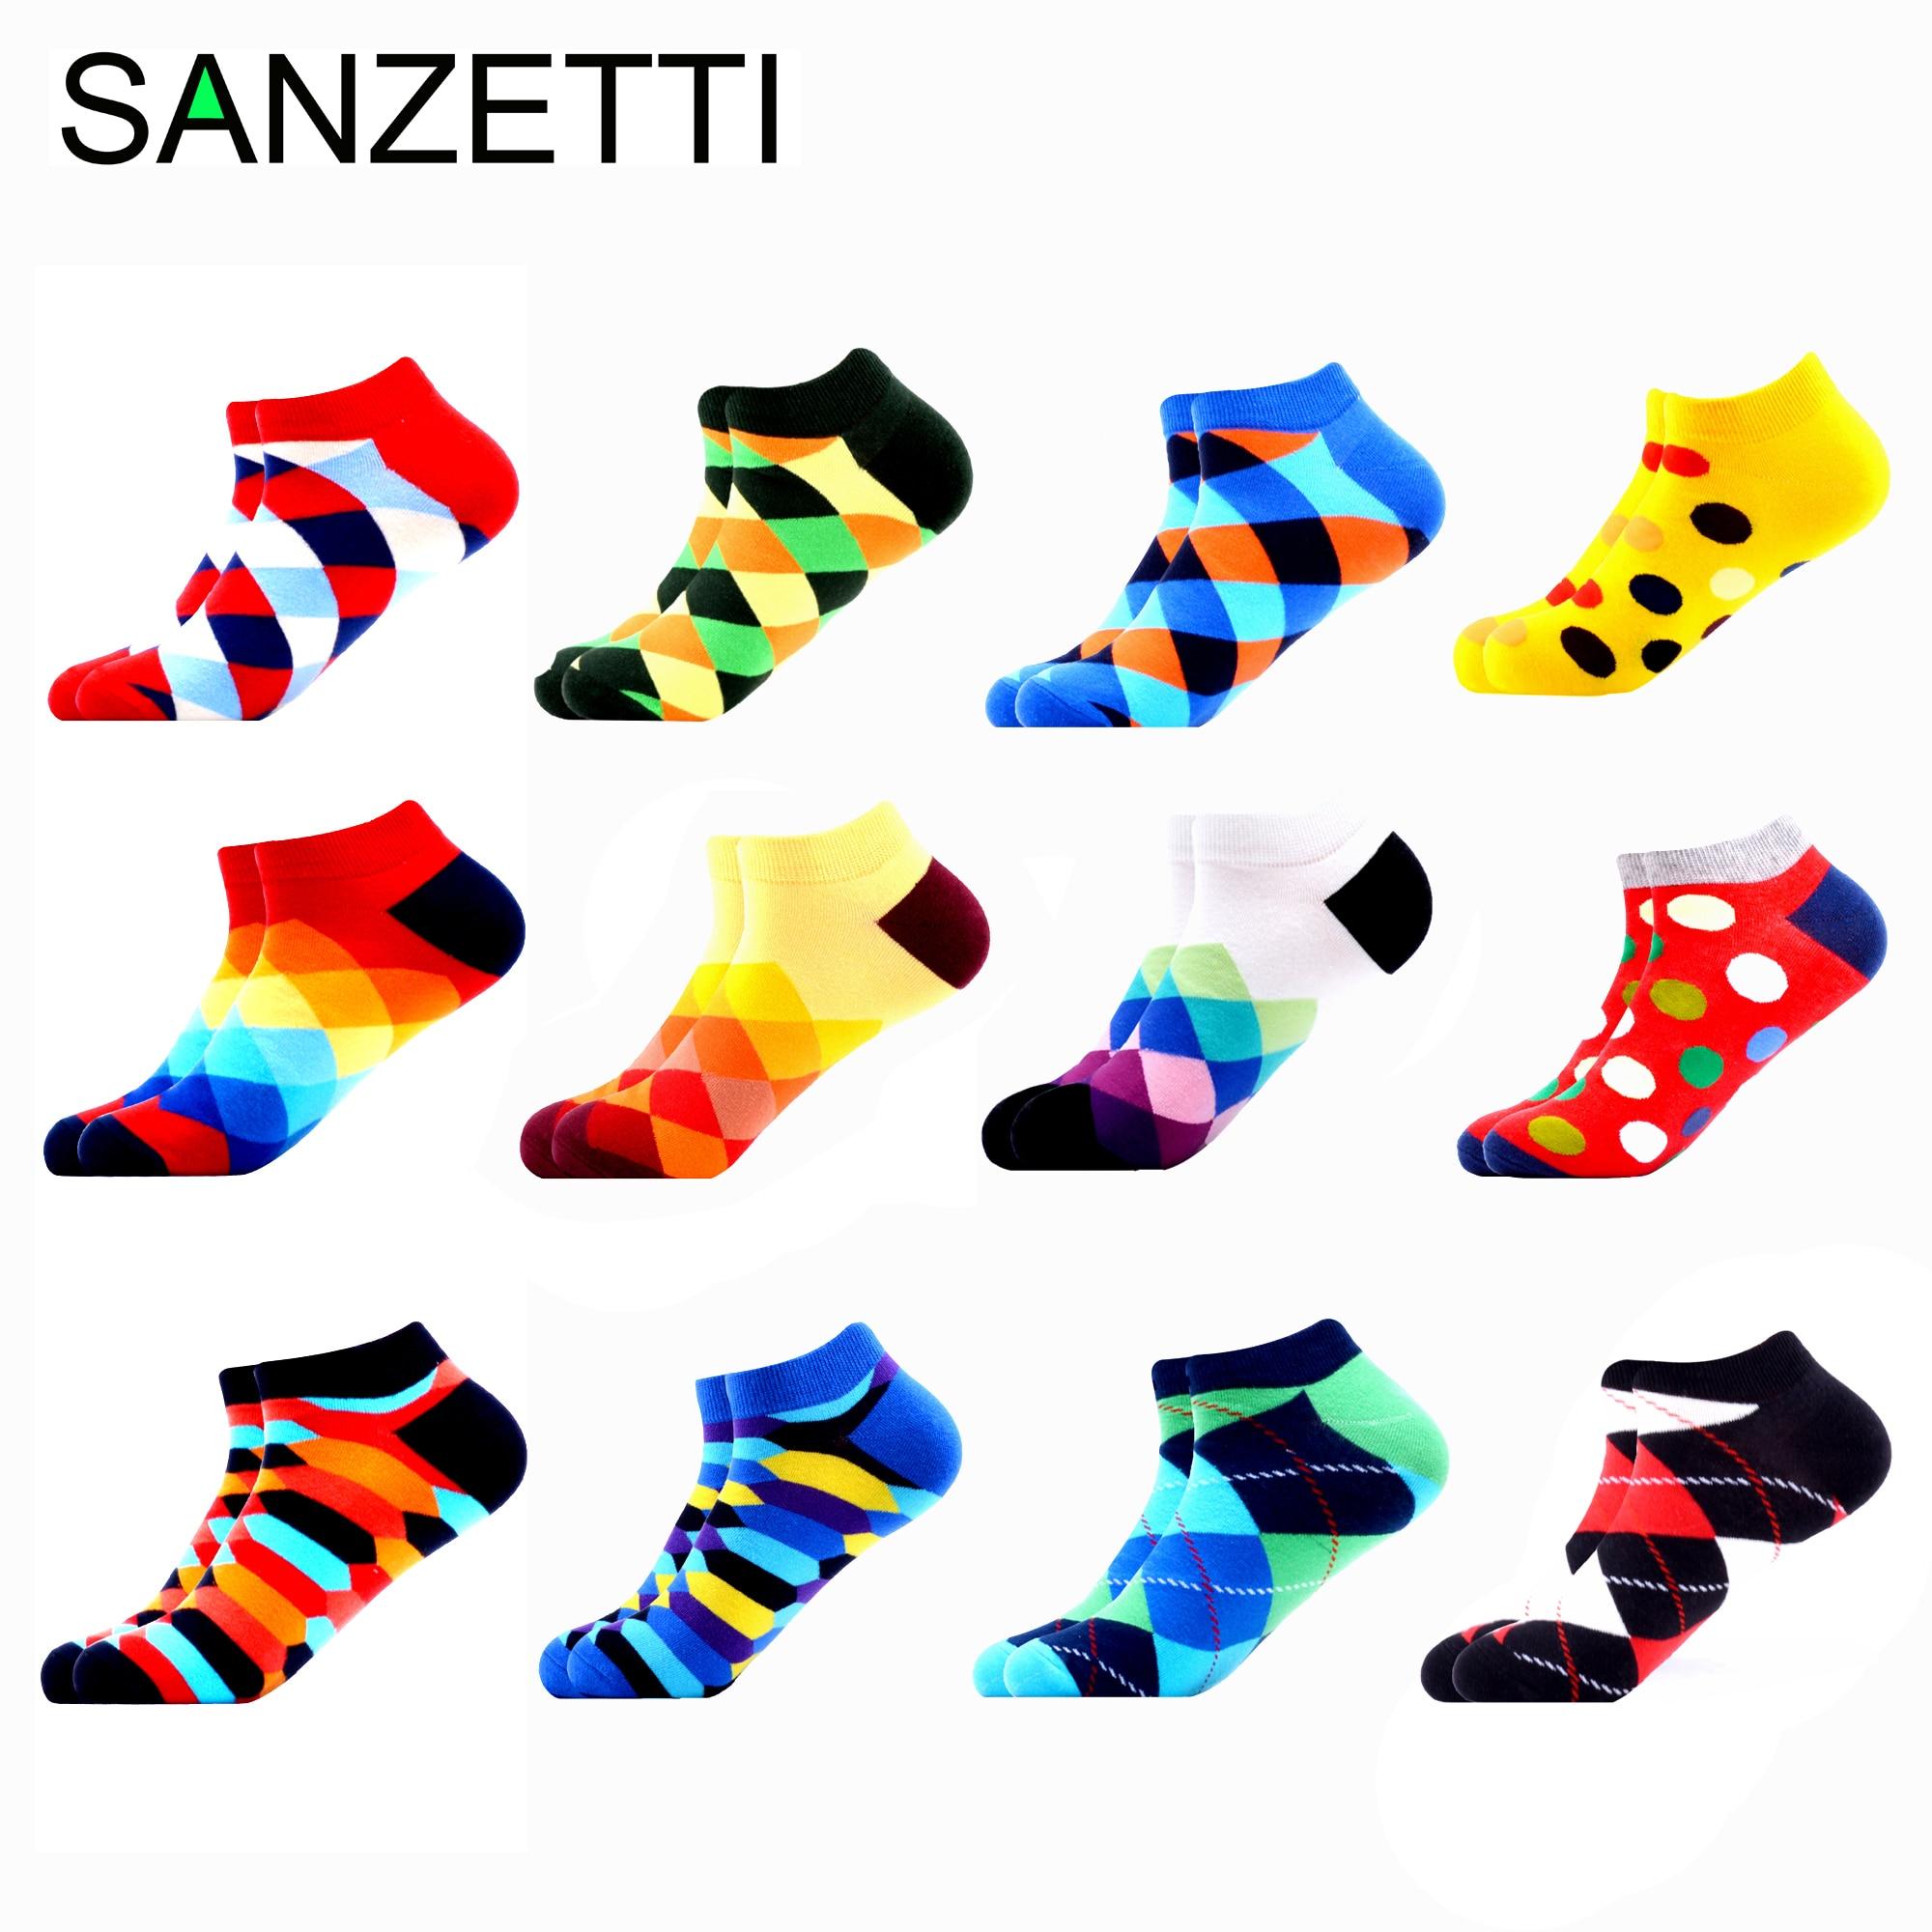 SANZETTI Men's Combed Cotton   Socks   Summer Casual Geometric Novelty Ankle   Socks   Harajuku Hip Hop High Quality Happy Dress   Socks